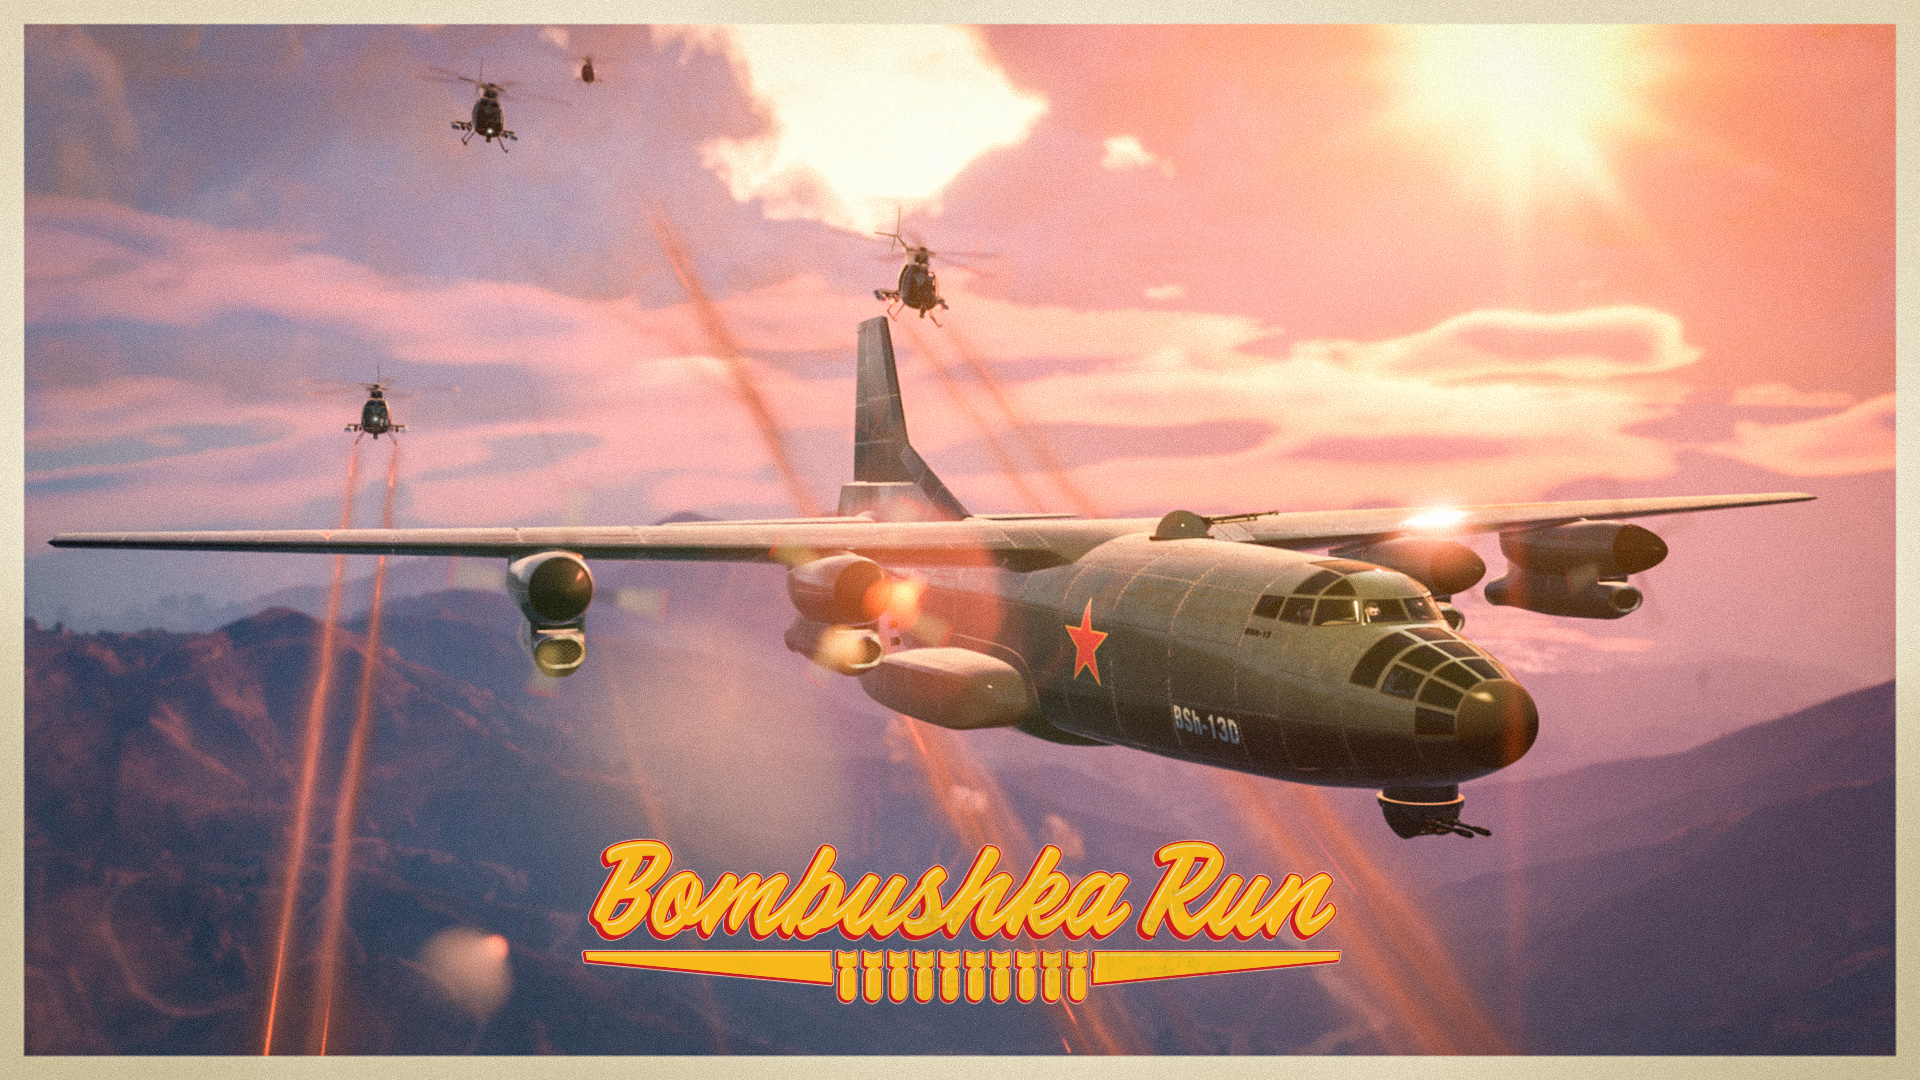 bombuska run gta online